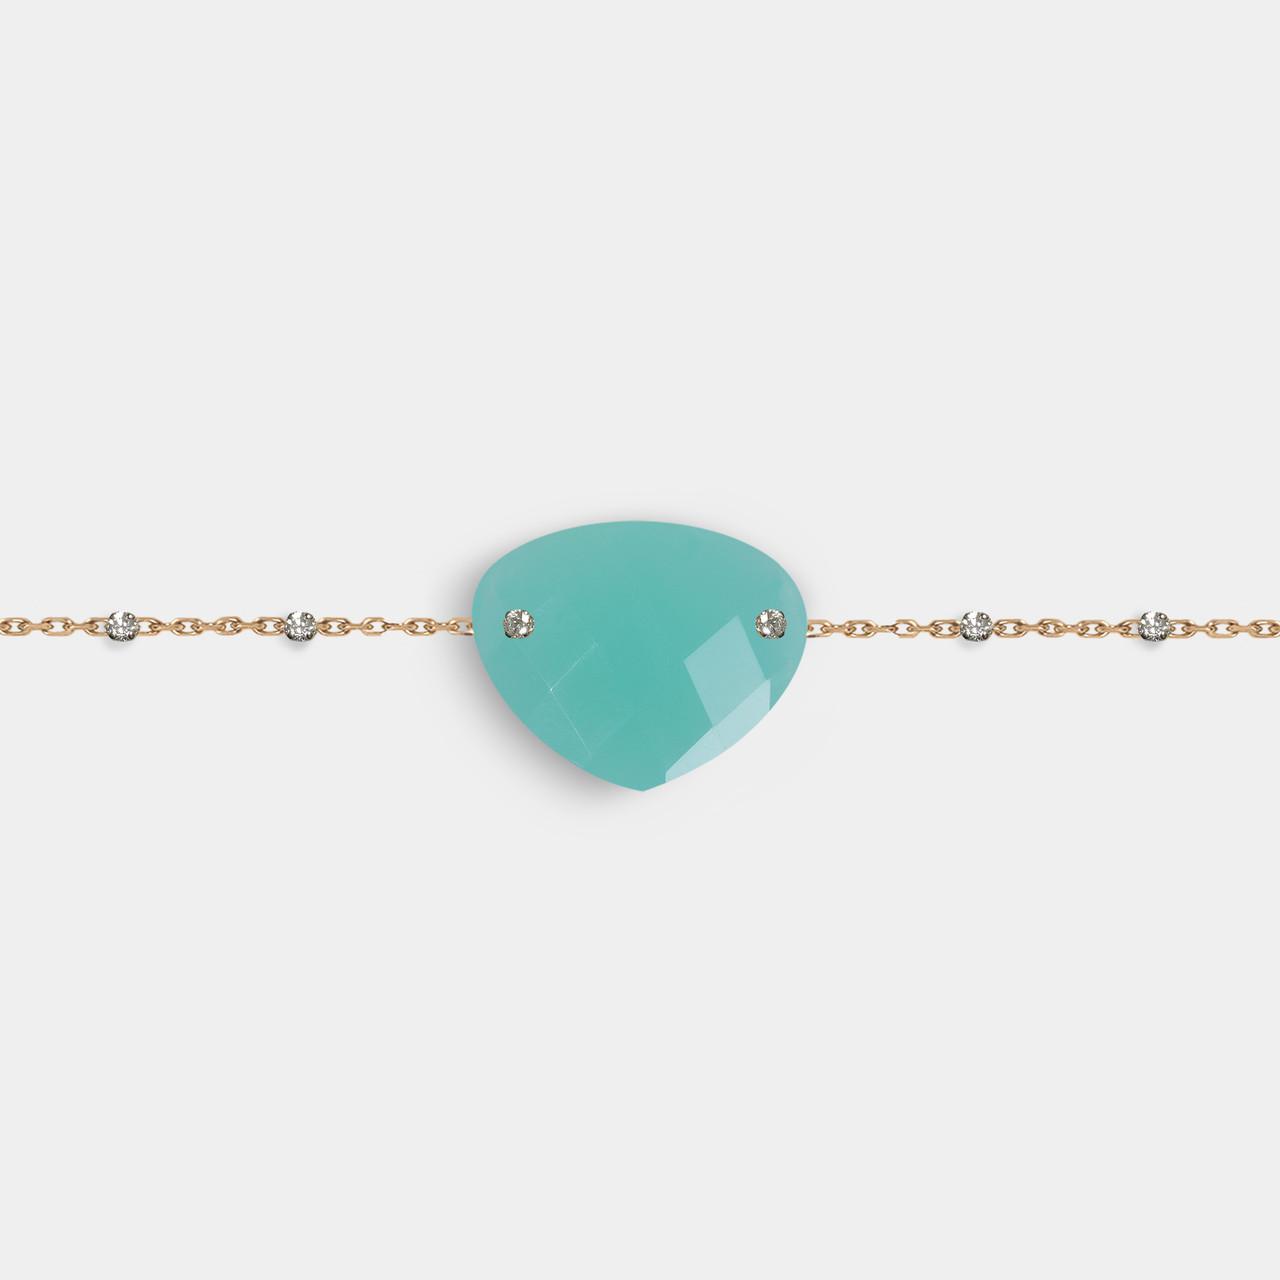 Bracelet Agate Bleue, Bracelet Or Femme Agate Bleue